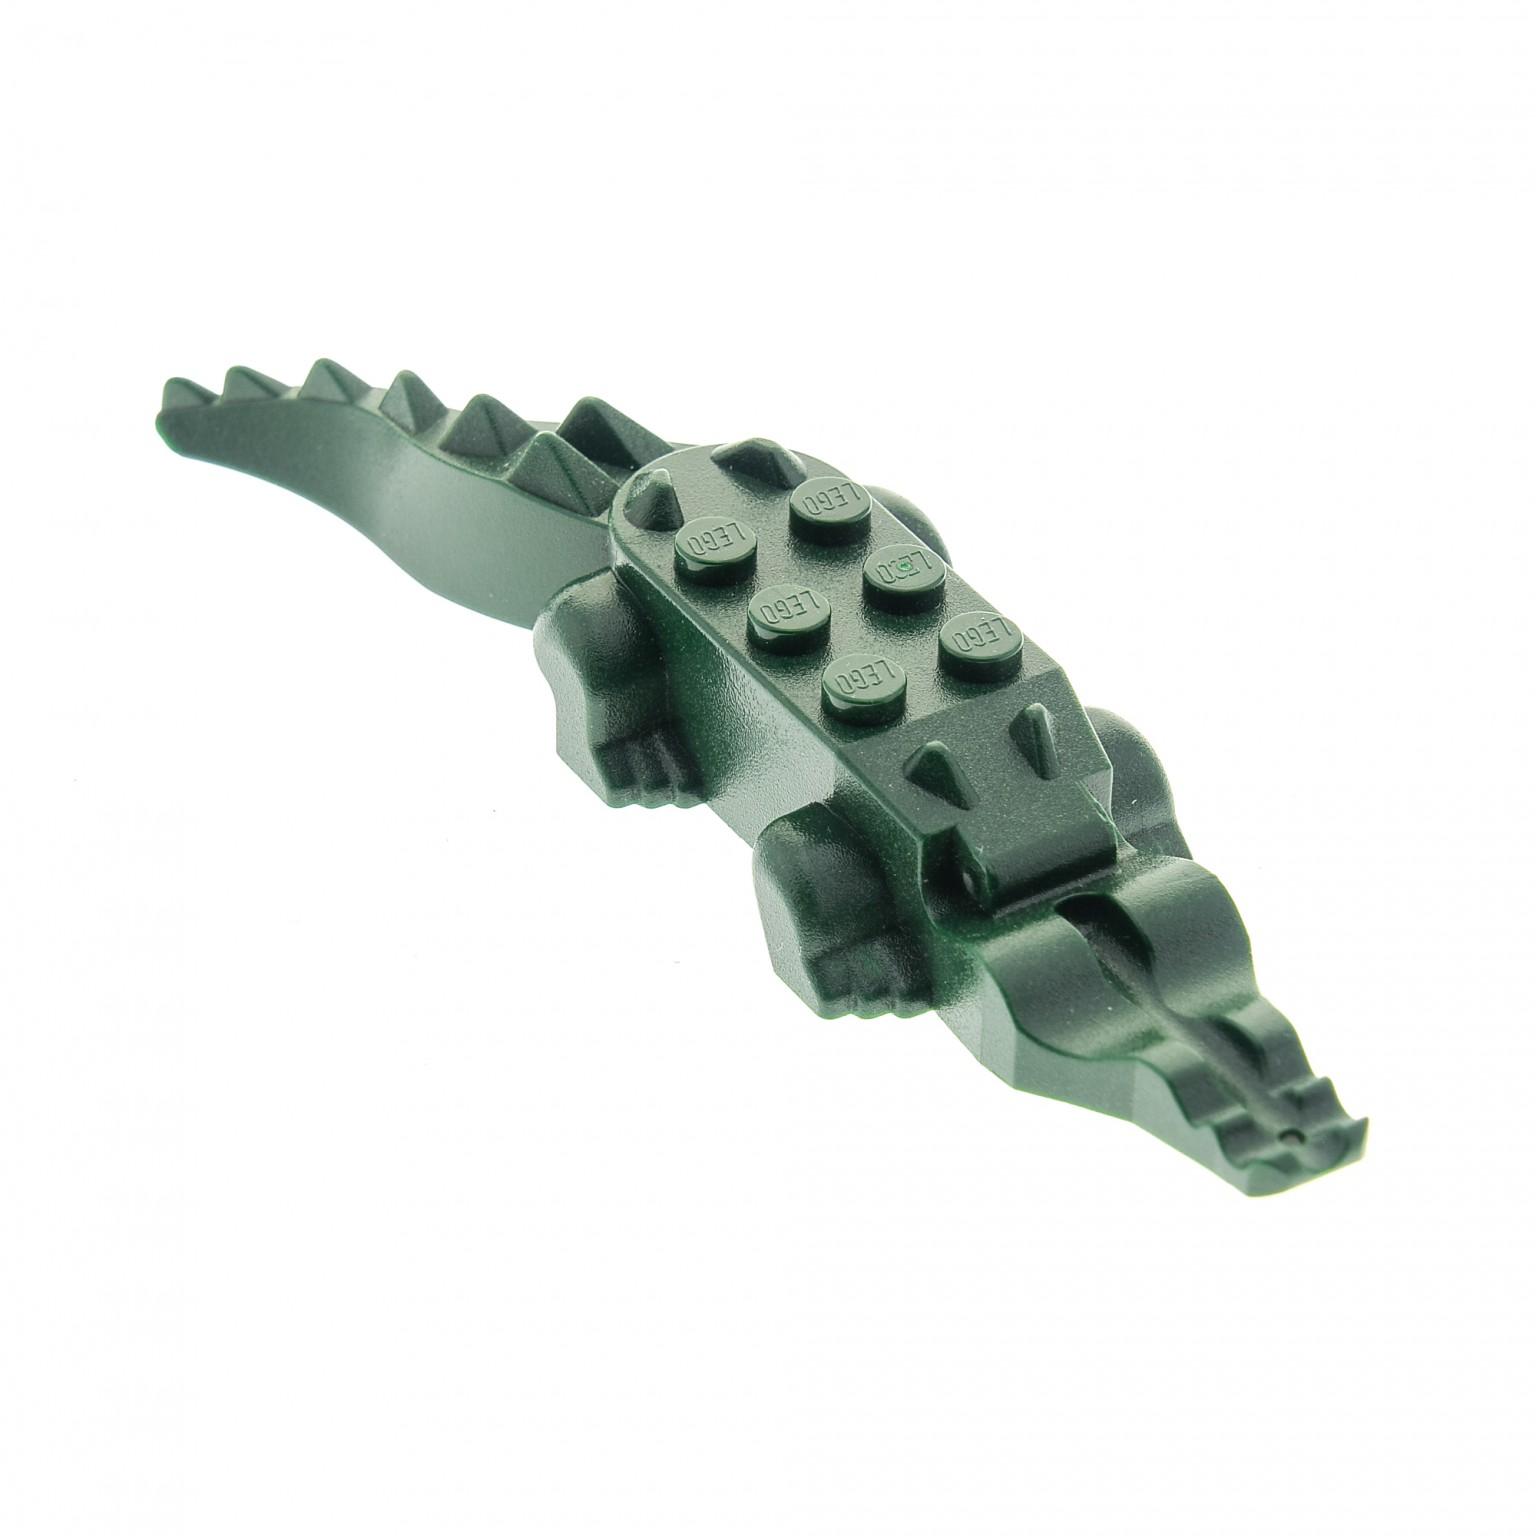 Lego Dark Green Alligator Crocodile Dragon Dinosaur Tail 6028 Replacement Part